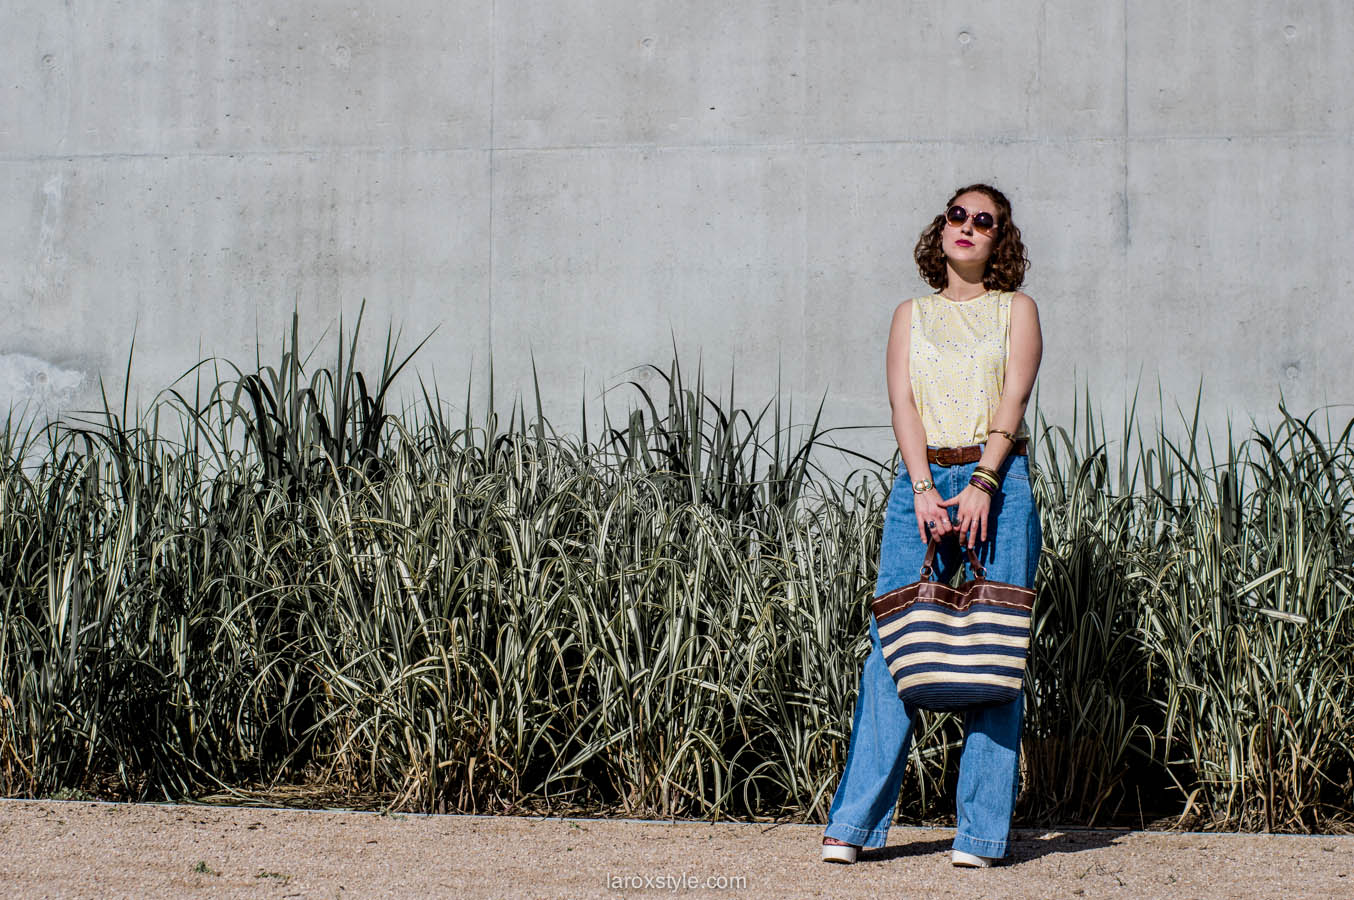 laroxstyle - blog mode lyon - look 70s - pantalon patte d elephant (17 sur 44)